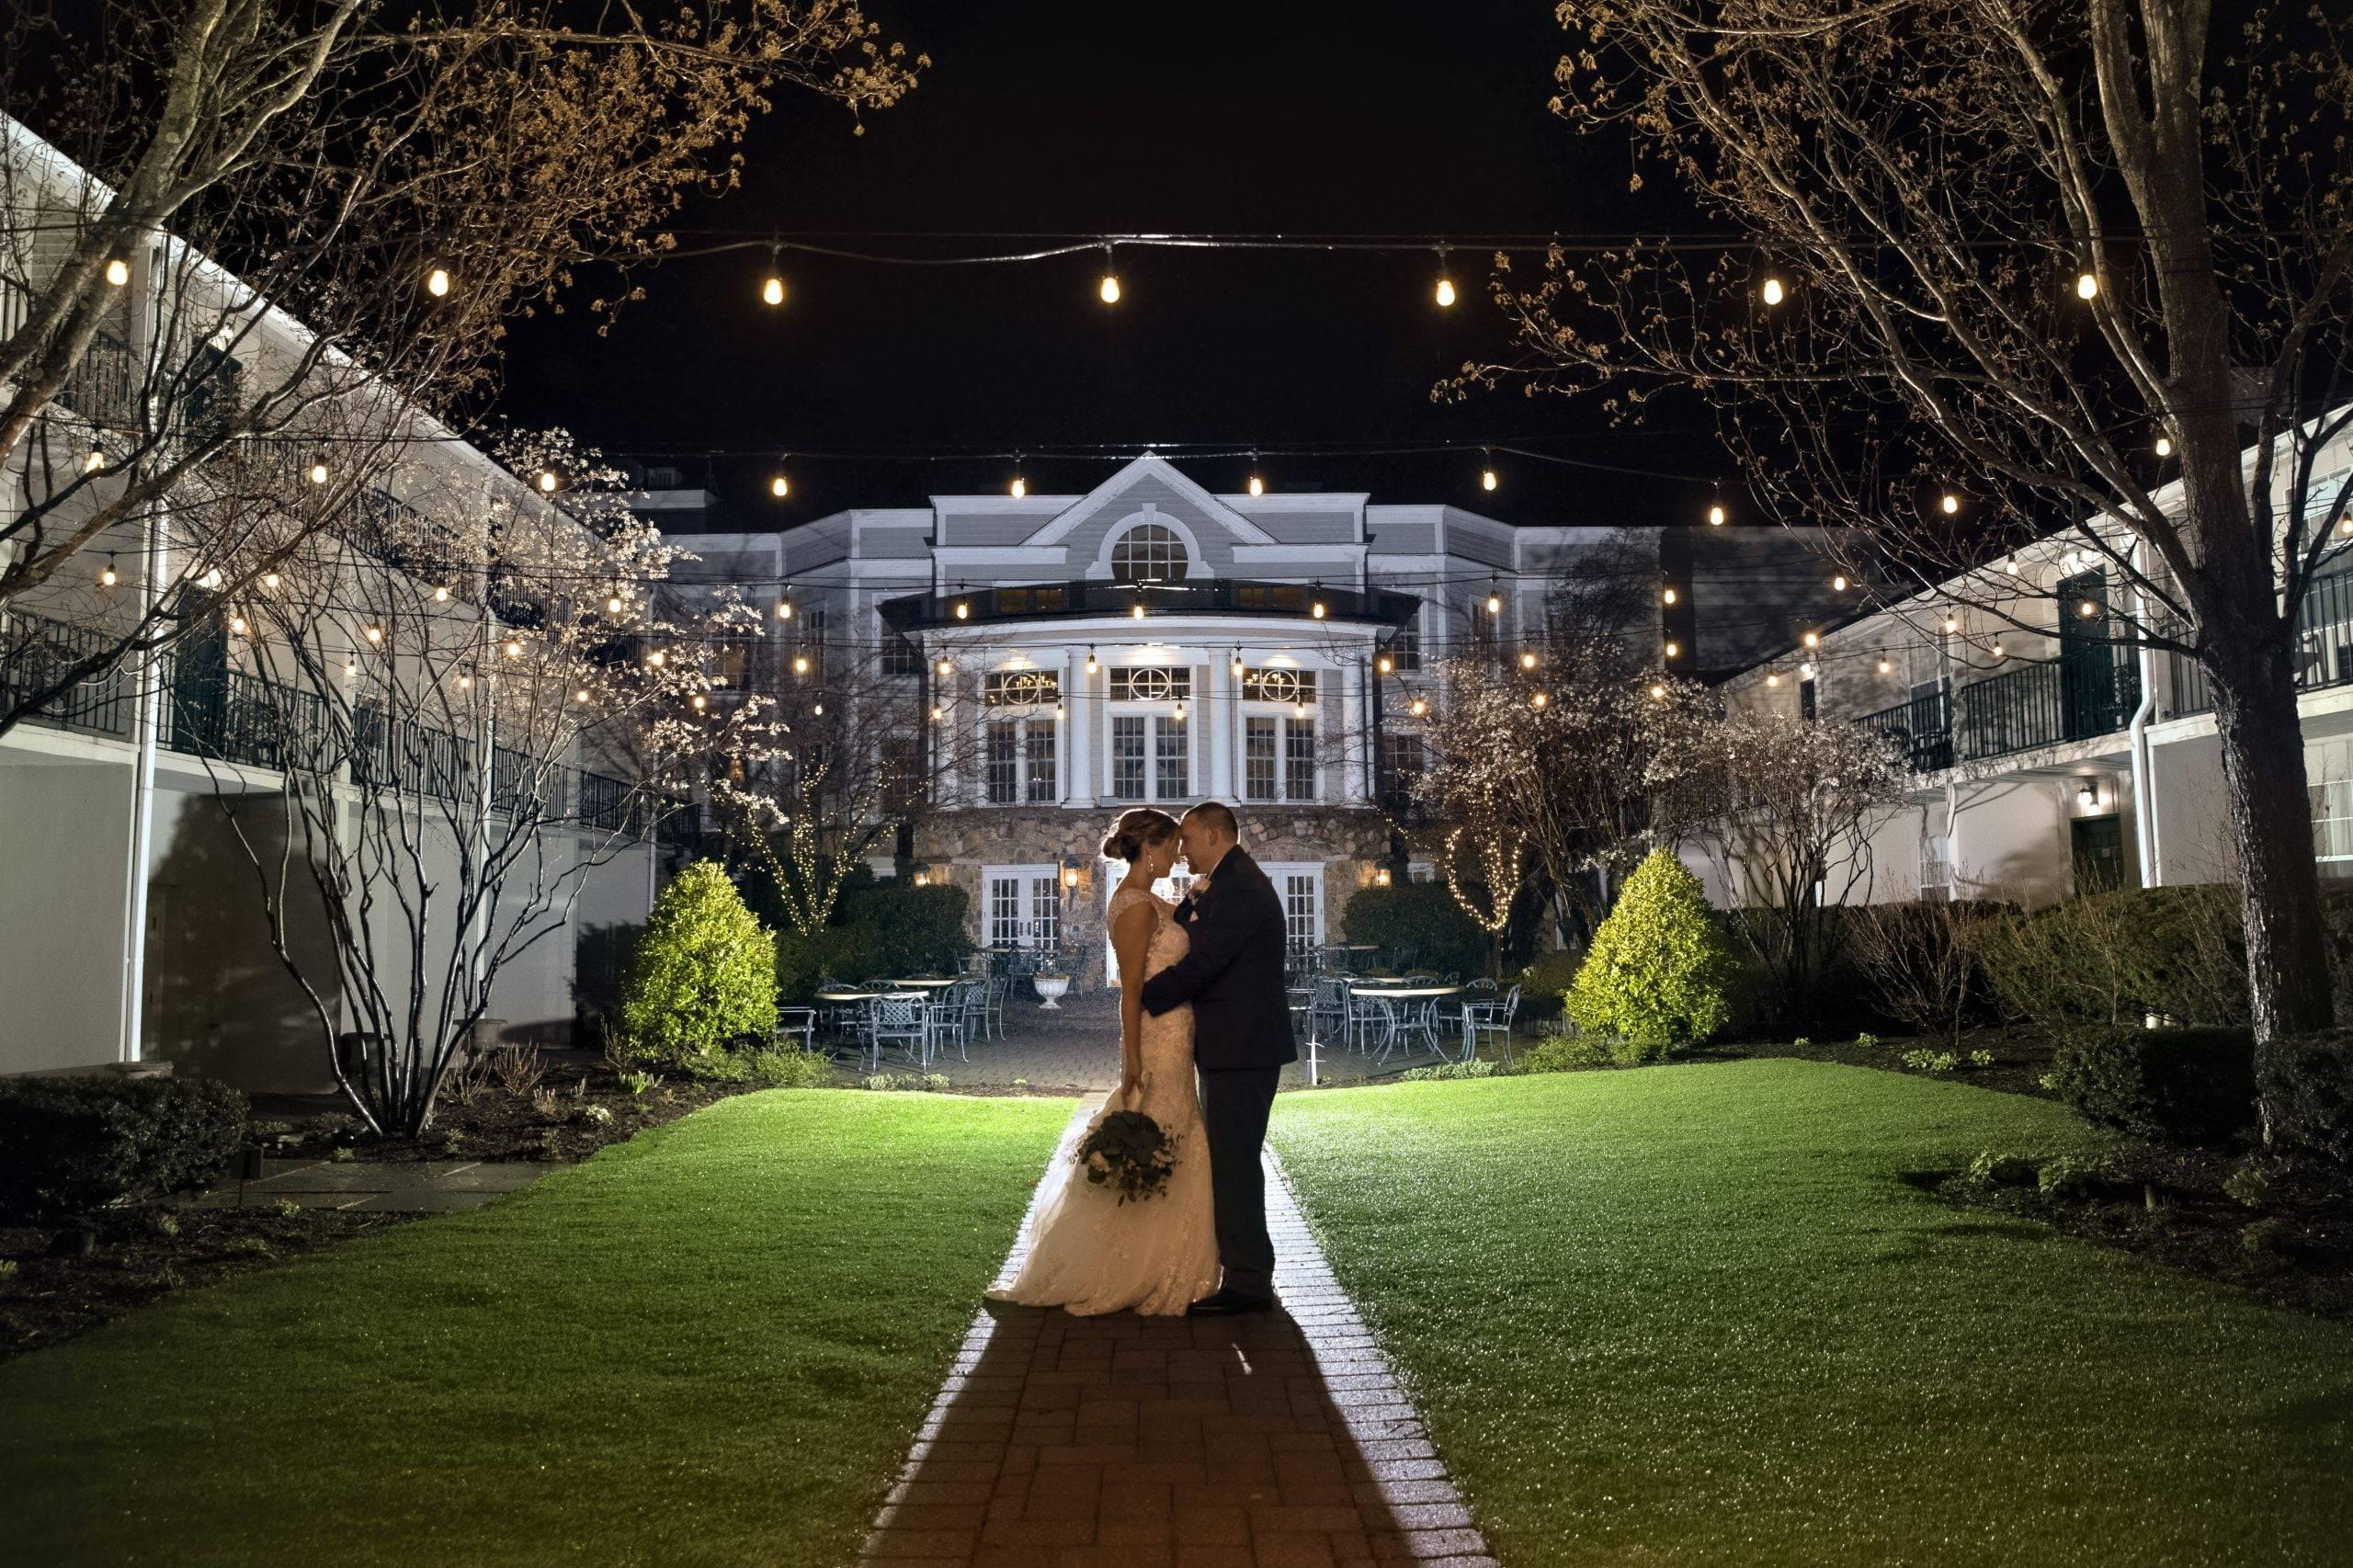 Olde Mill Inn wedding couple in courtyard at night